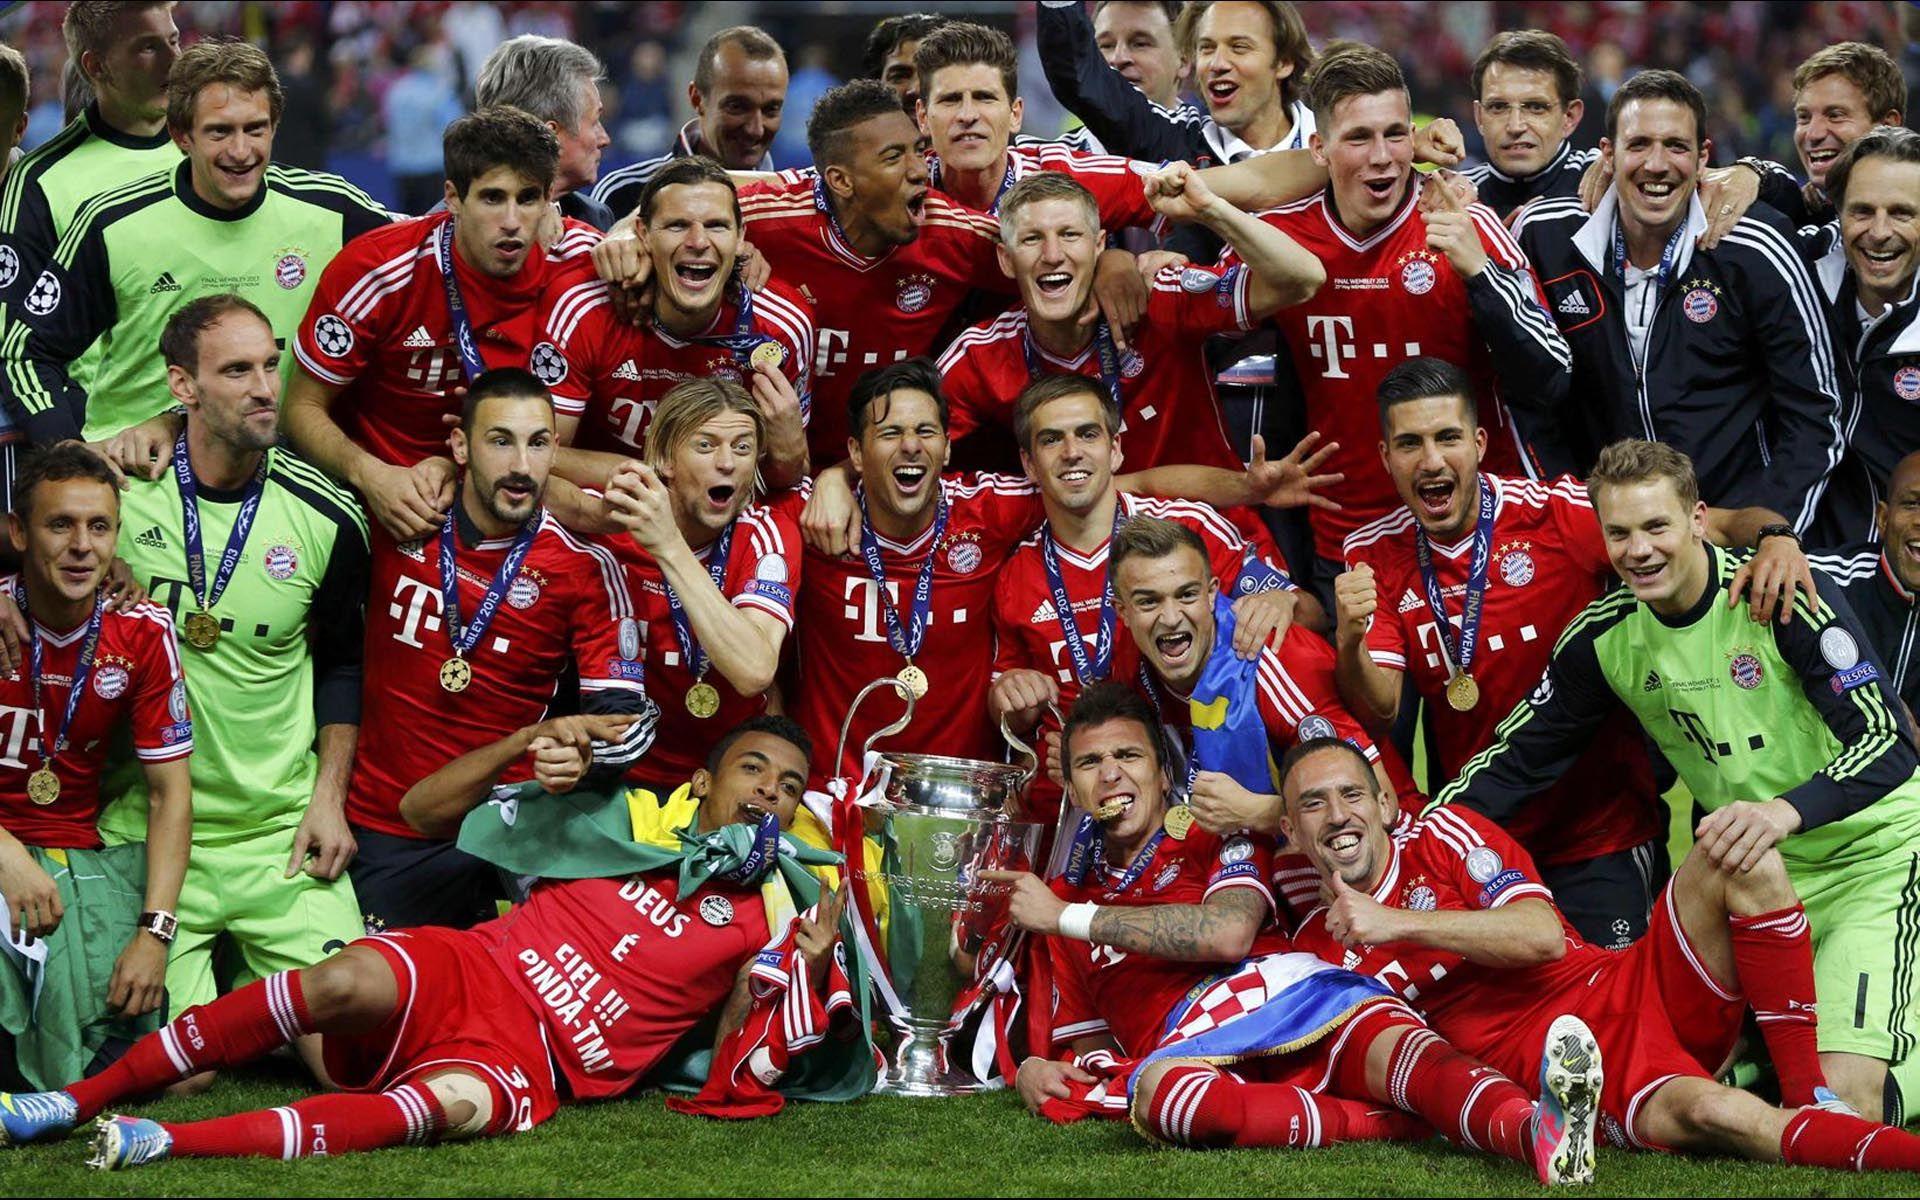 Bayern Munchen Football Club Wallpaper: Bayern-Munich-Champions-League-Winners-2013-HD-Wallpaper